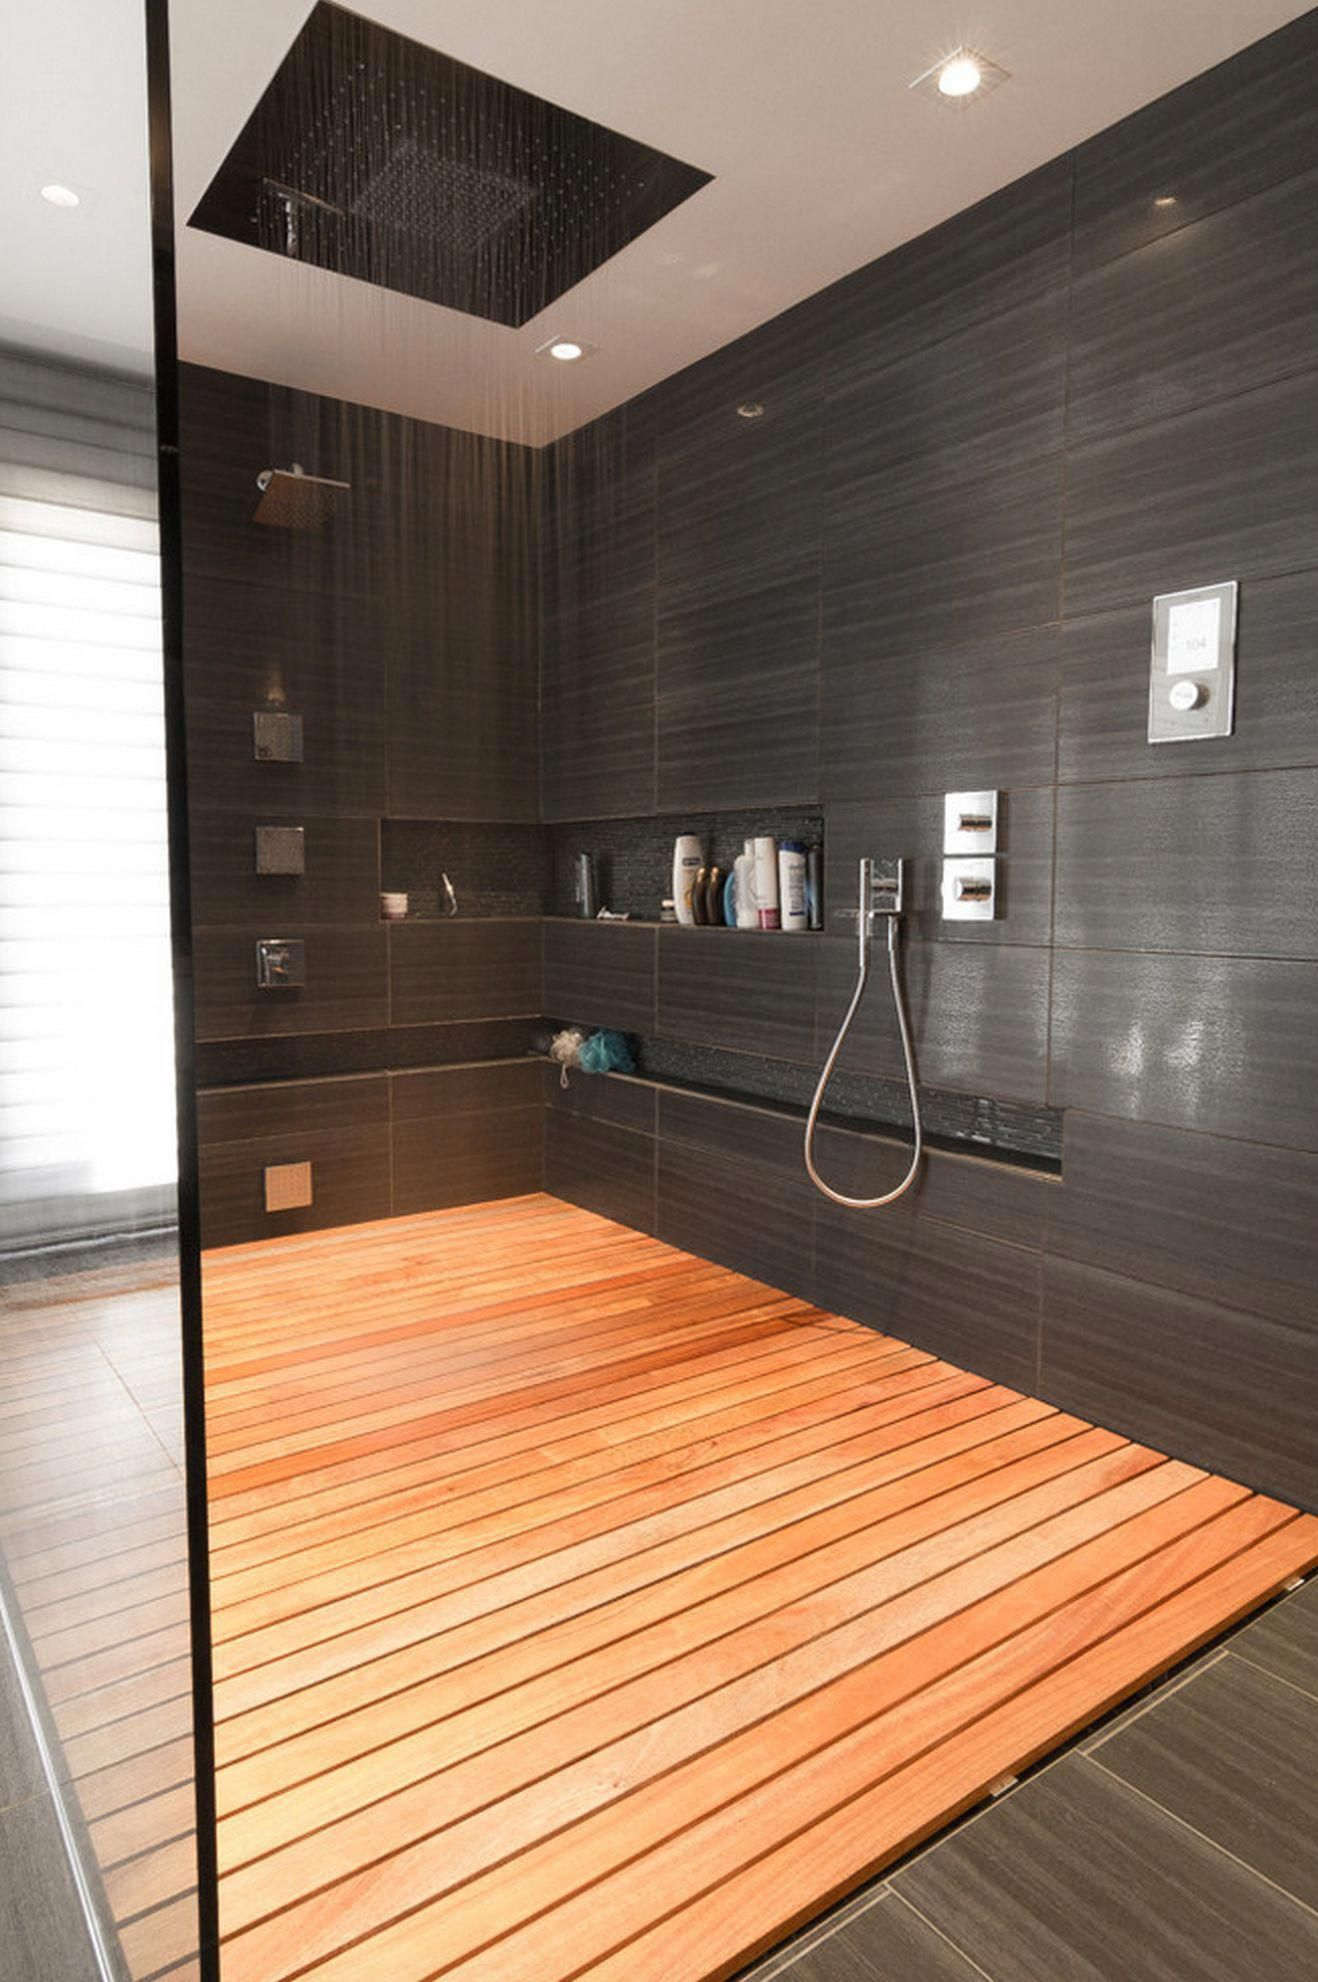 nice 44 Perfect Master Bathroom Design Ideas For Small ... on Nice Bathroom Designs For Small Spaces  id=52205